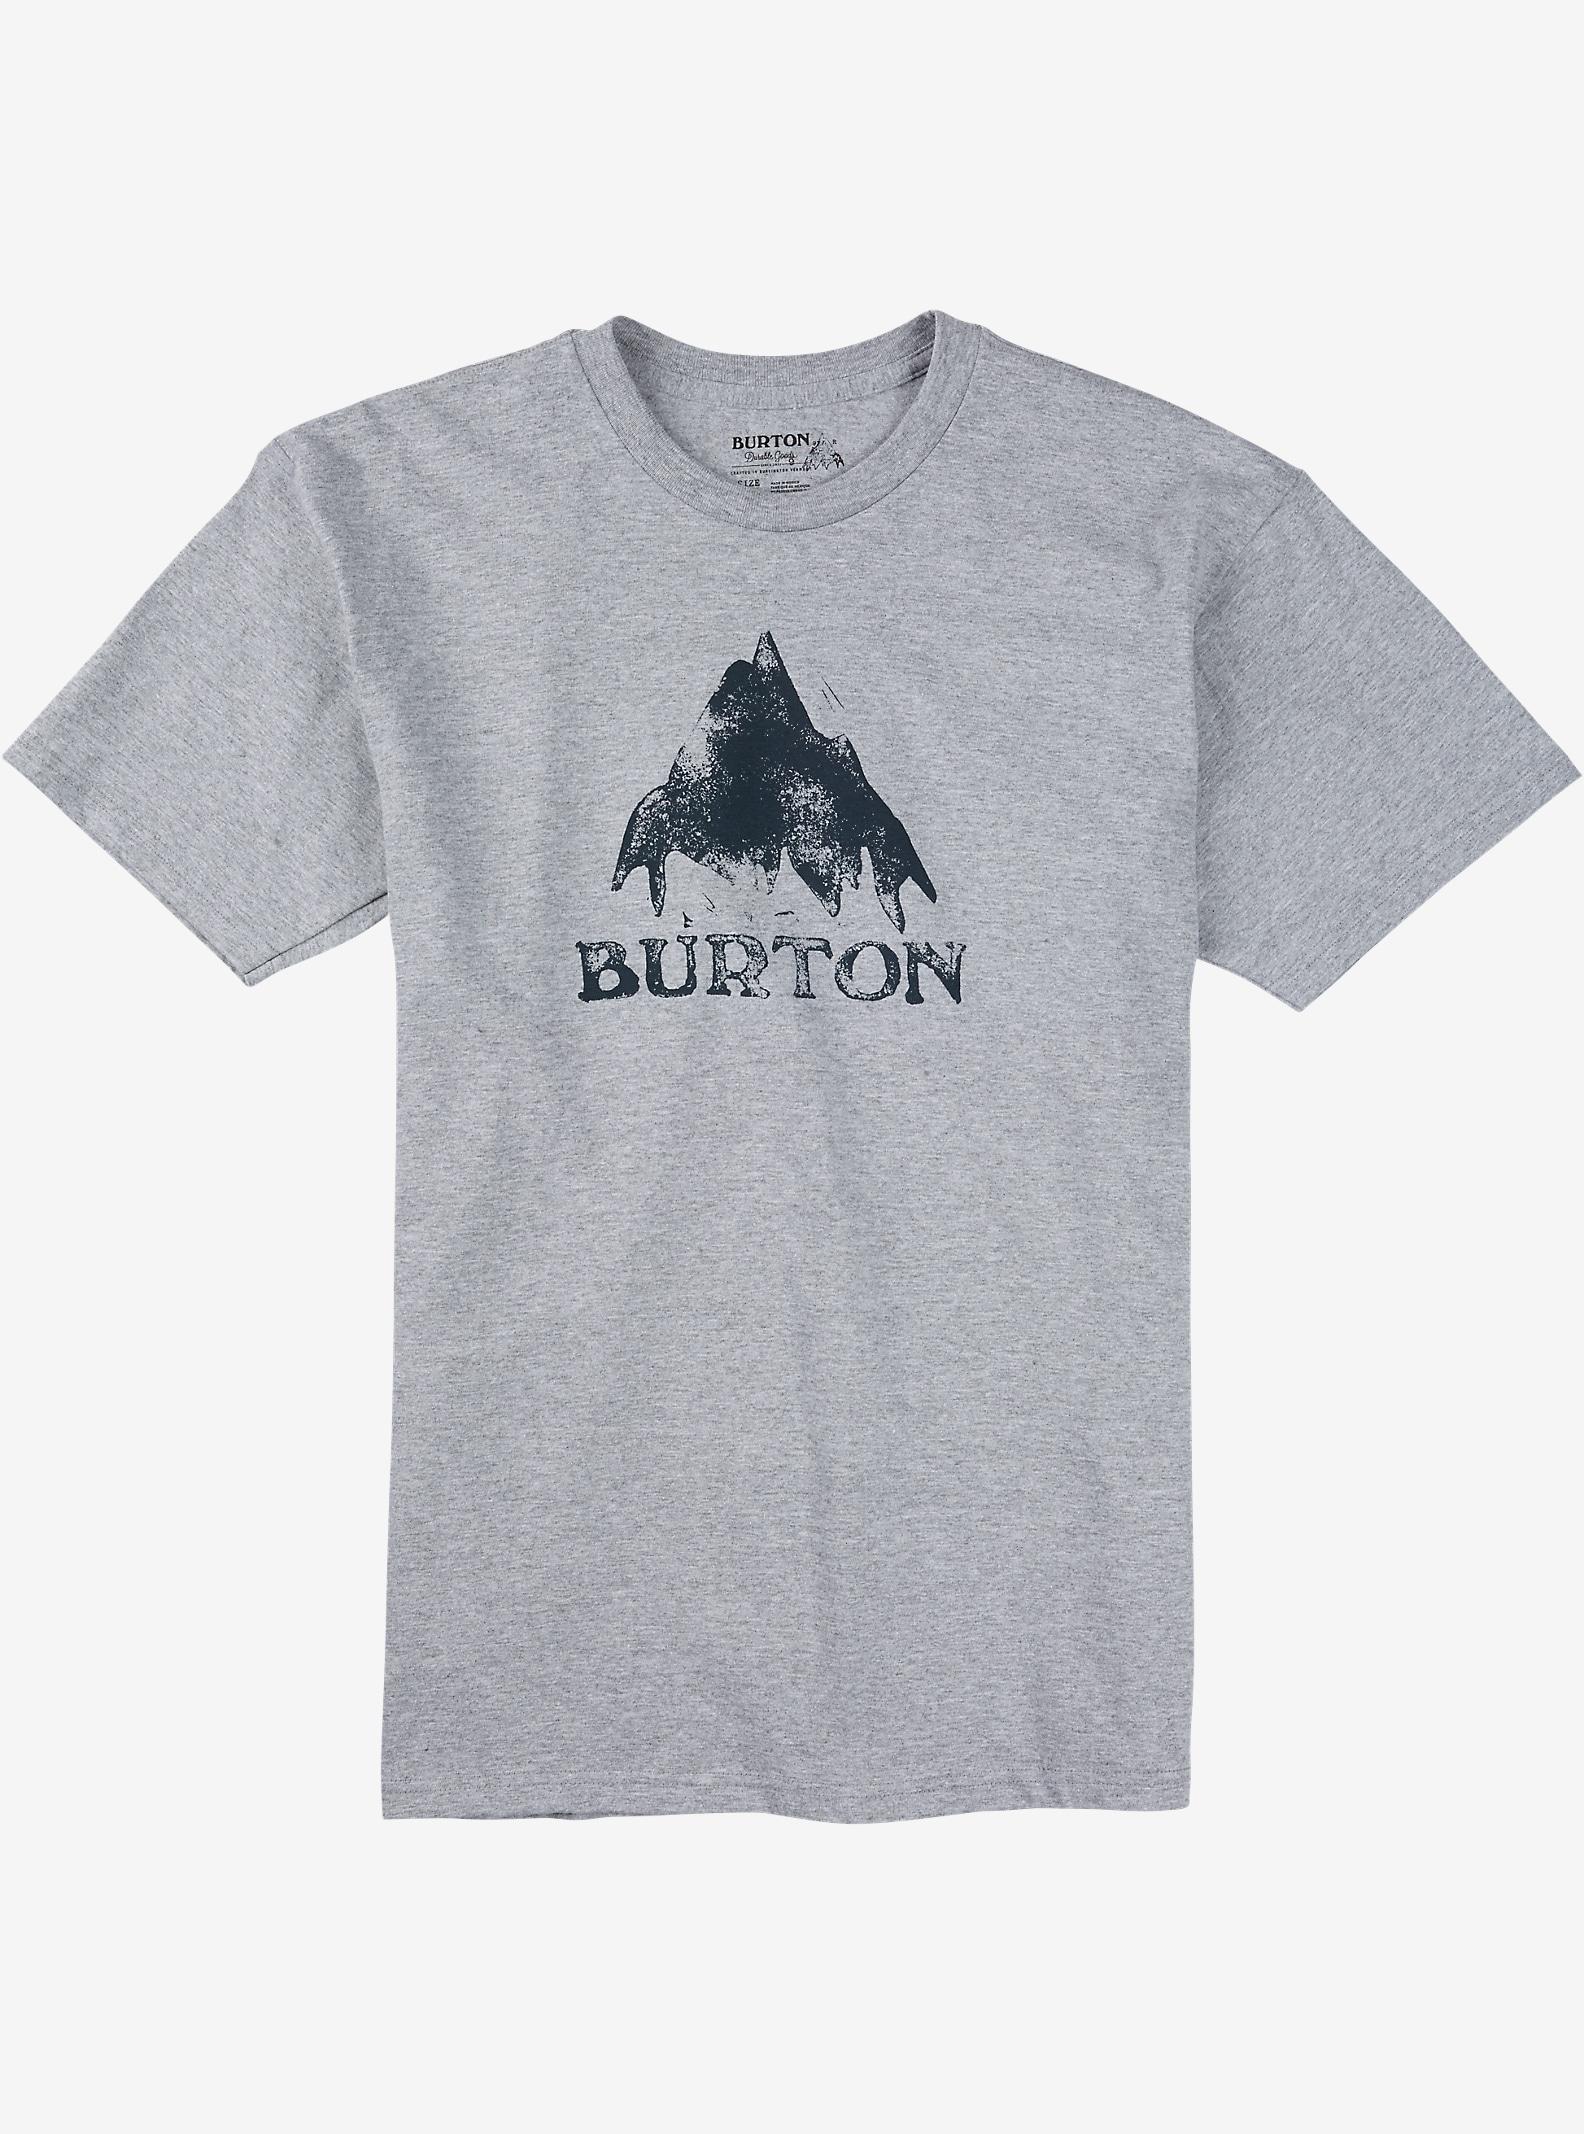 Burton Stamped Mountain Short Sleeve T Shirt shown in Gray Heather